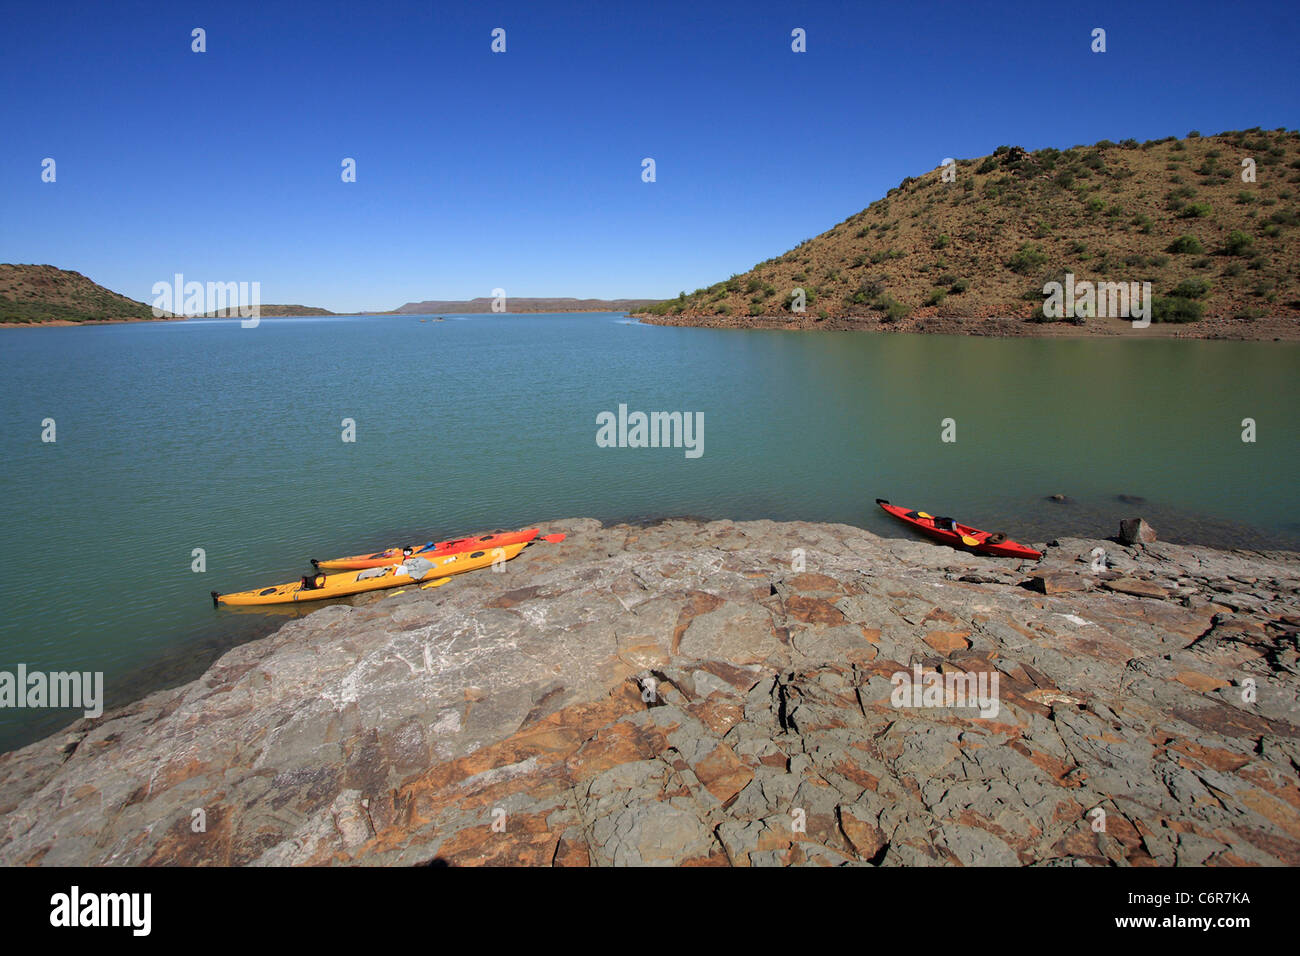 Kayaks on rock island in Van Der Kloof Dam - Stock Image